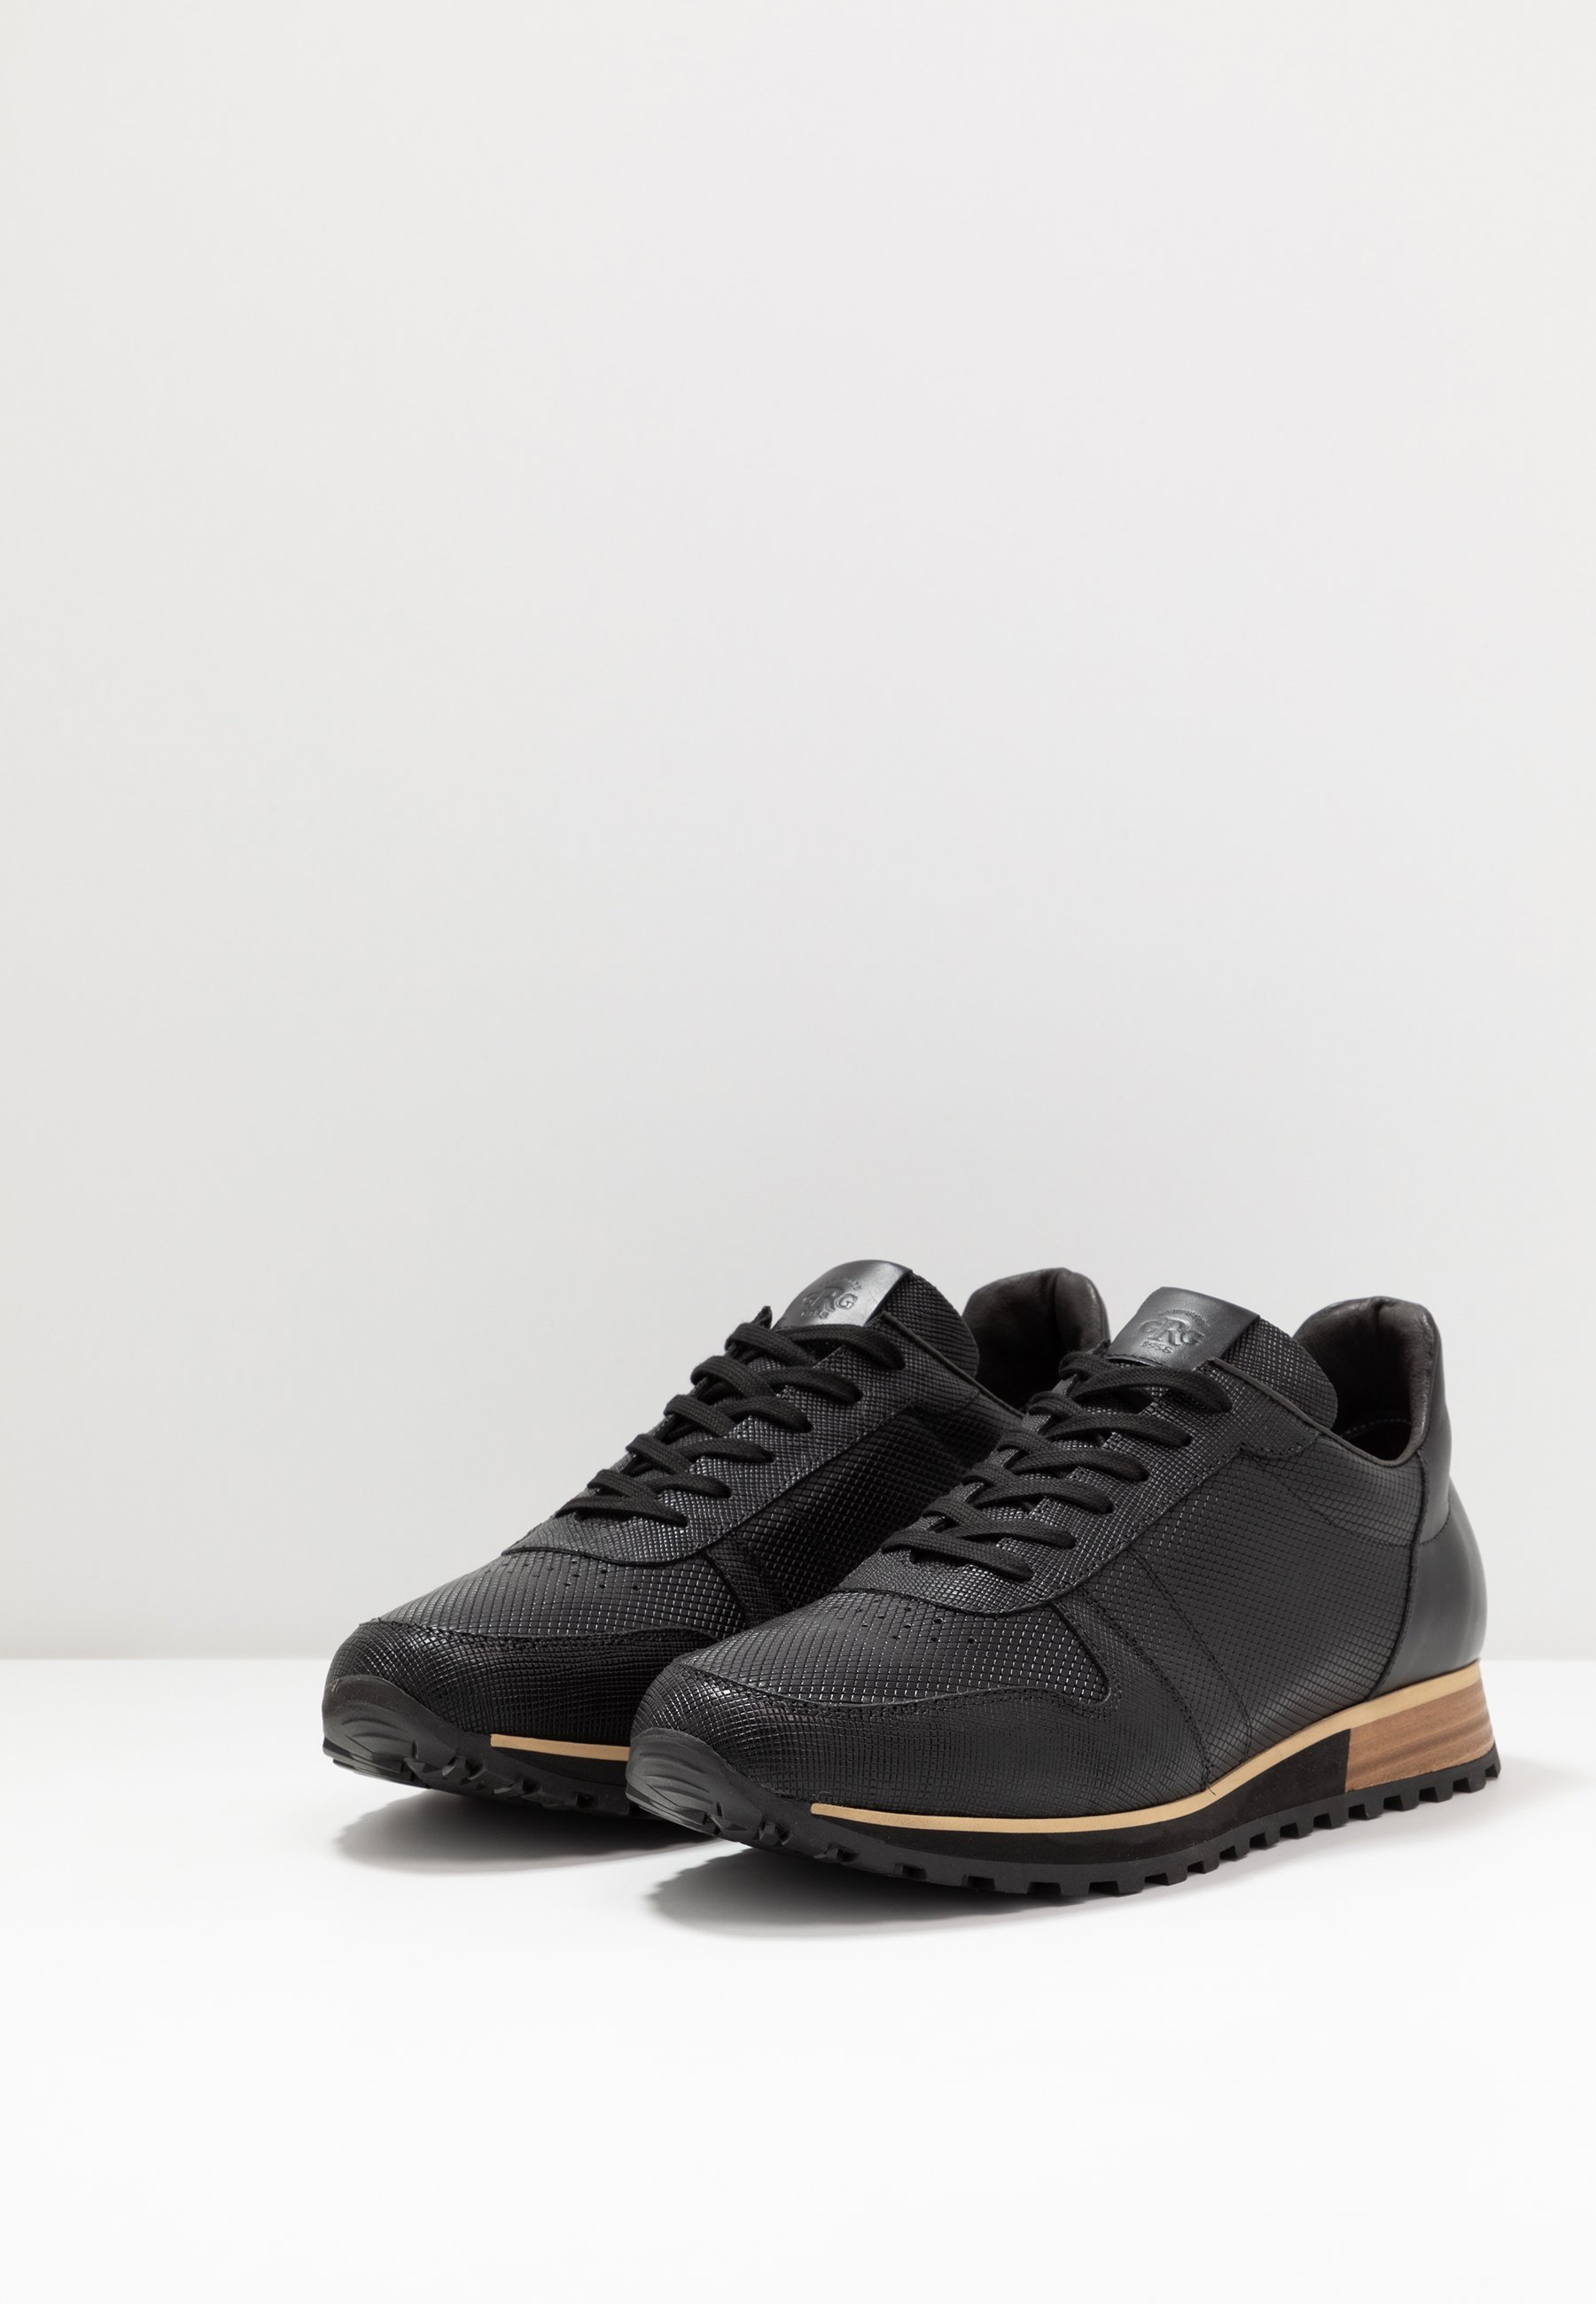 Giorgio 1958 Sneaker low - texas/virginia/montana nero/schwarz - Herrenschuhe tE0bh